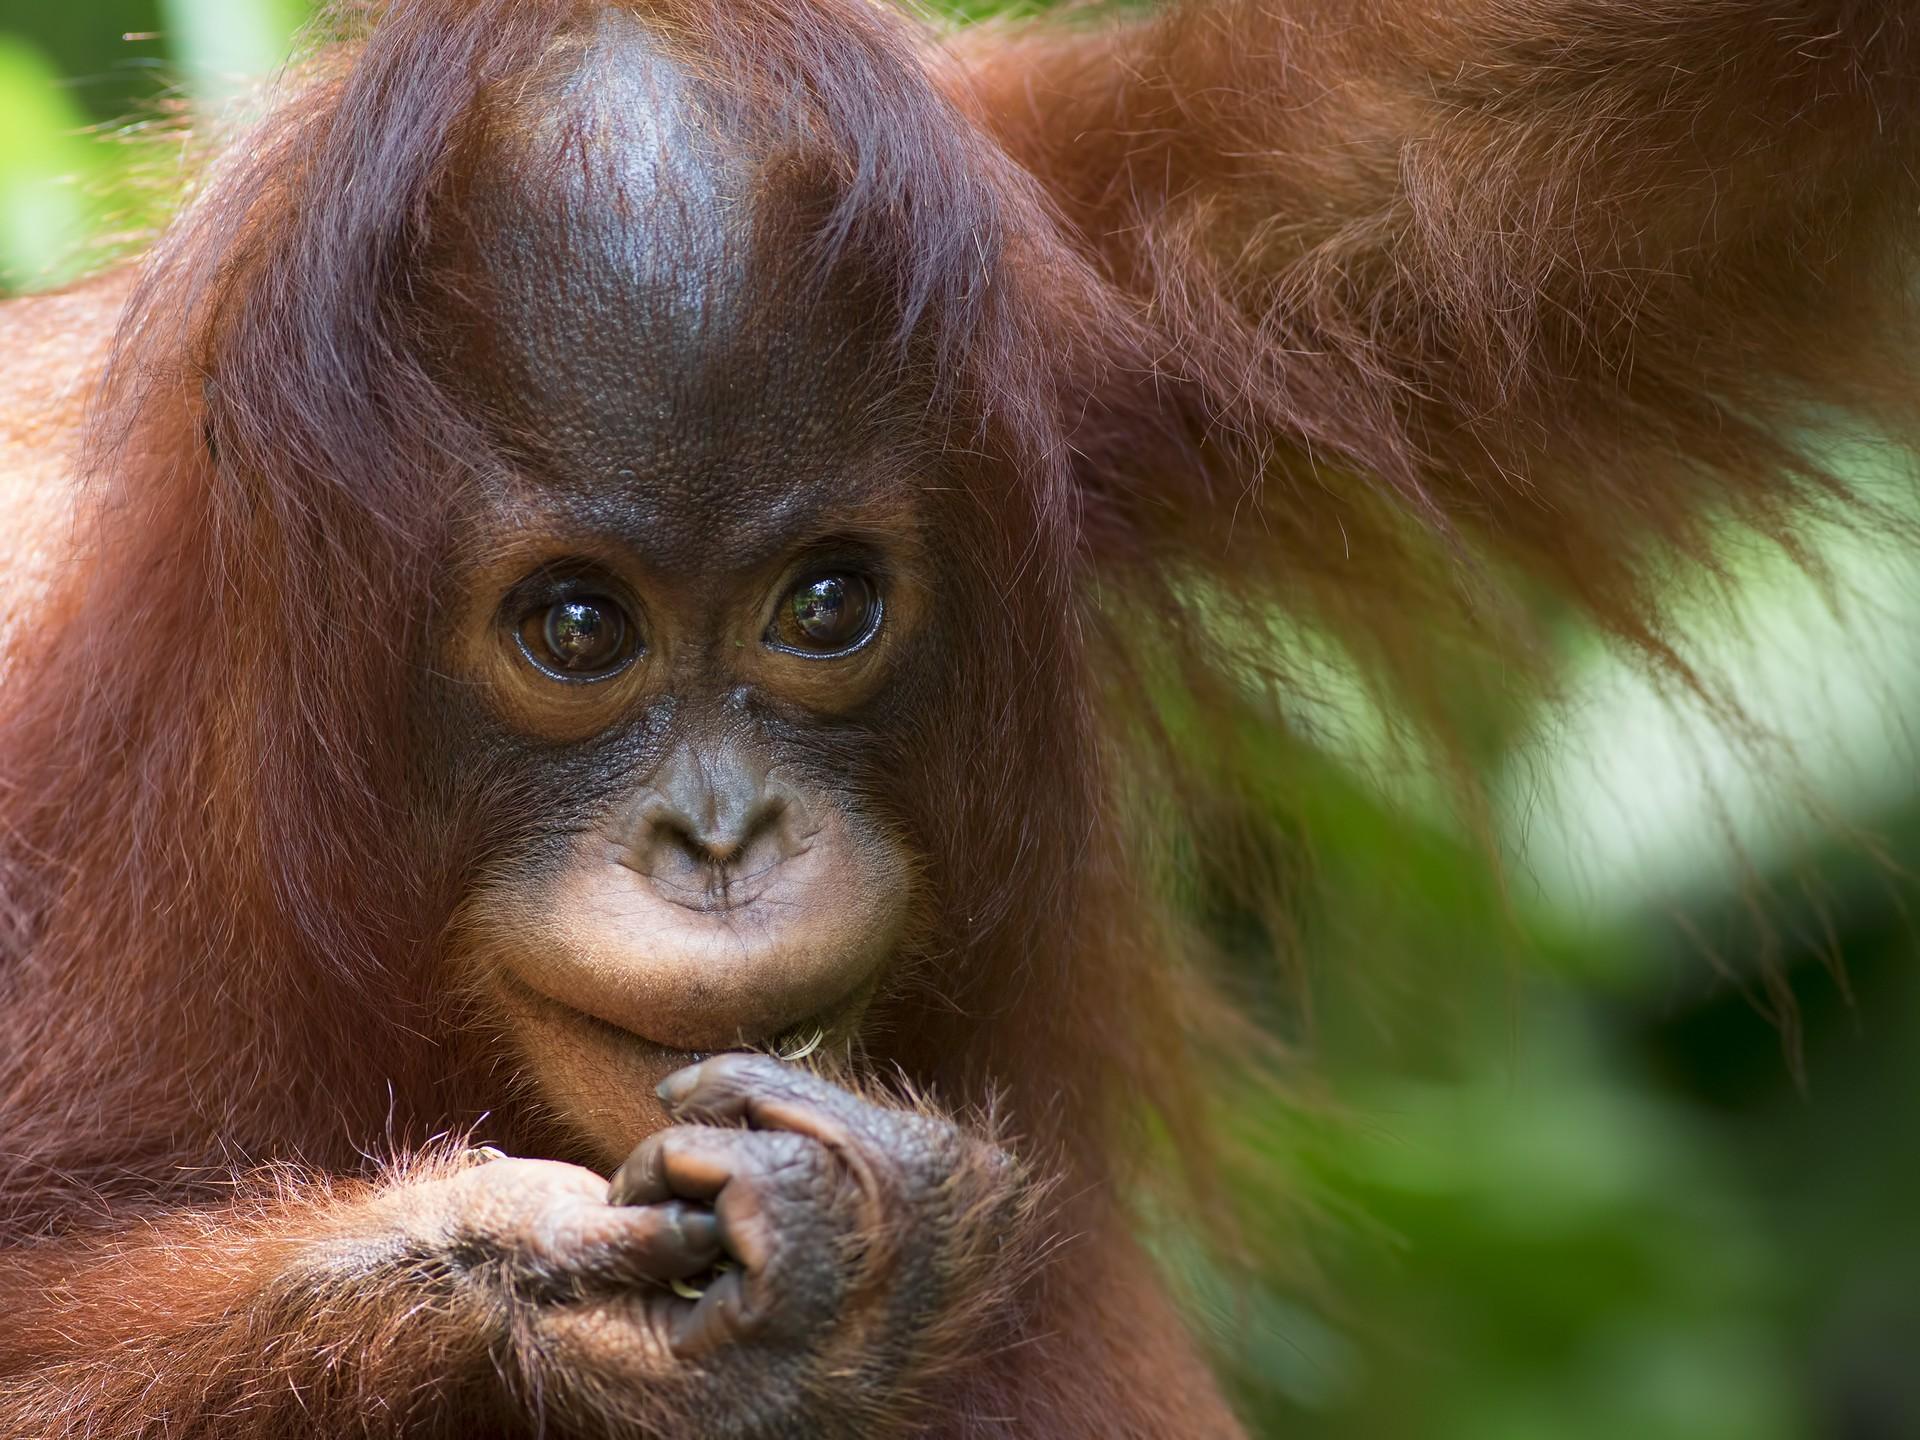 Borneo holidays: Baby orangutan in Sepilok